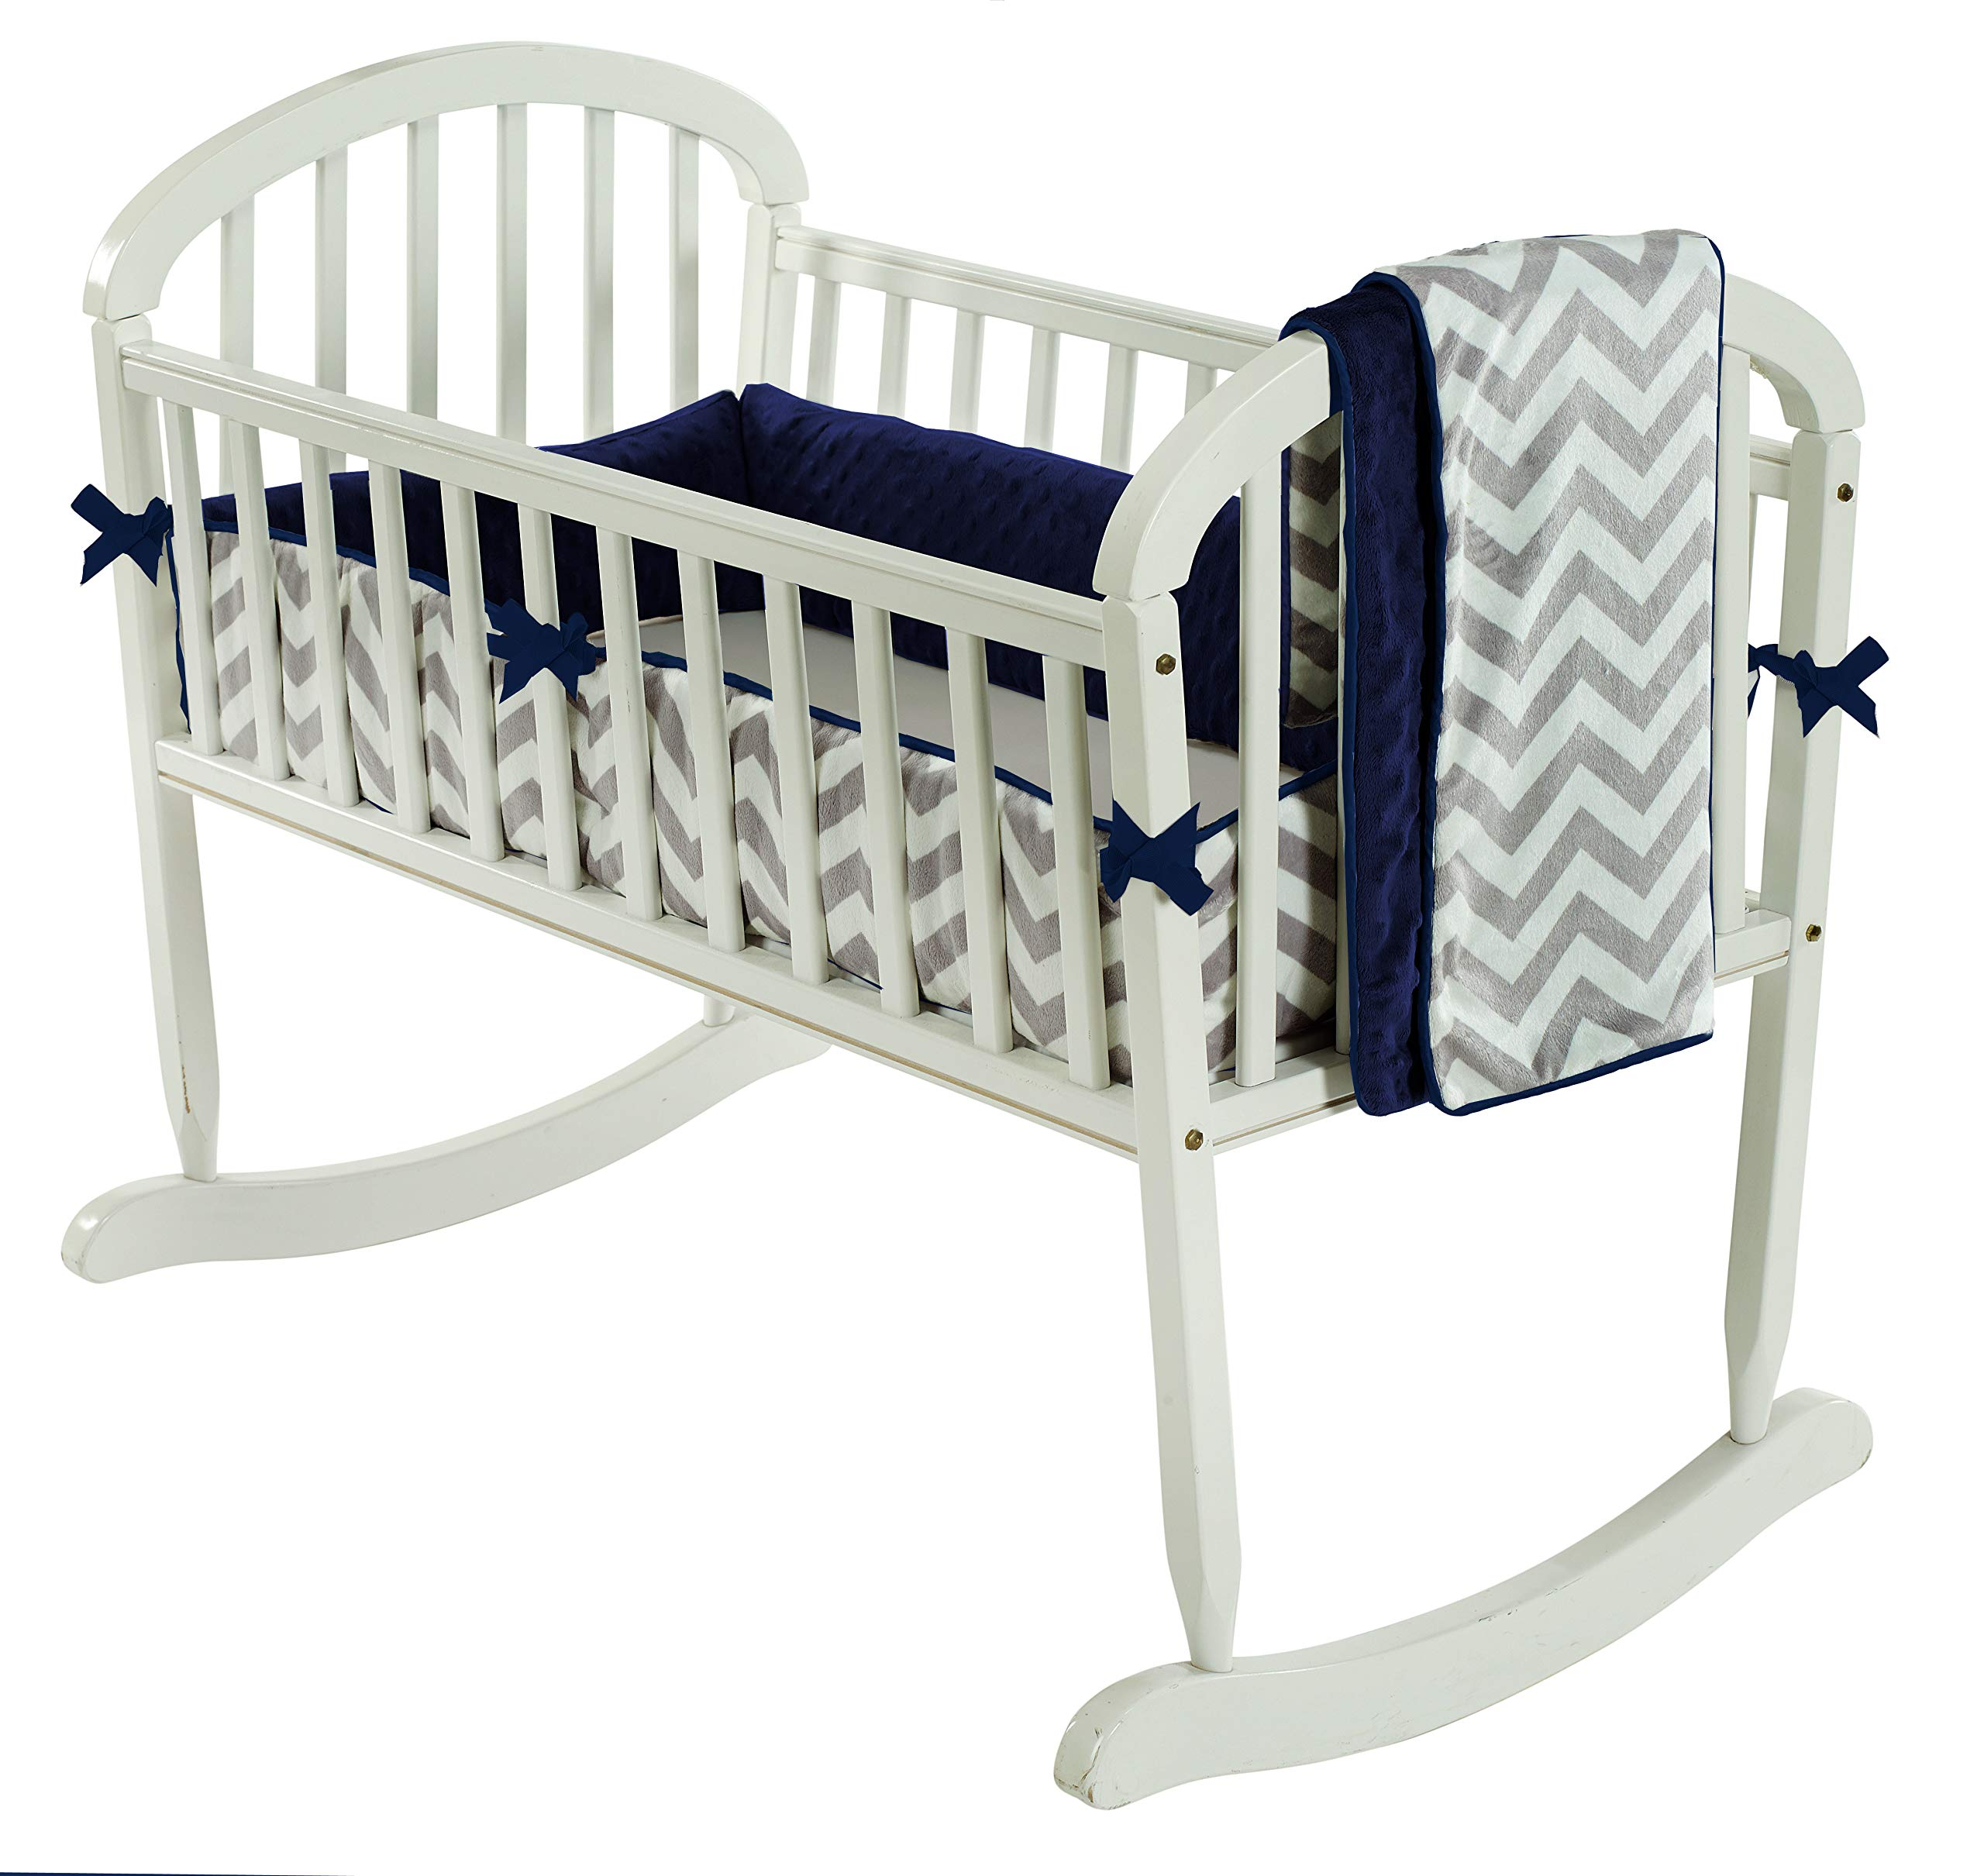 Baby Doll Bedding Minky Chevron Cradle Bedding Set, Navy by BabyDoll Bedding